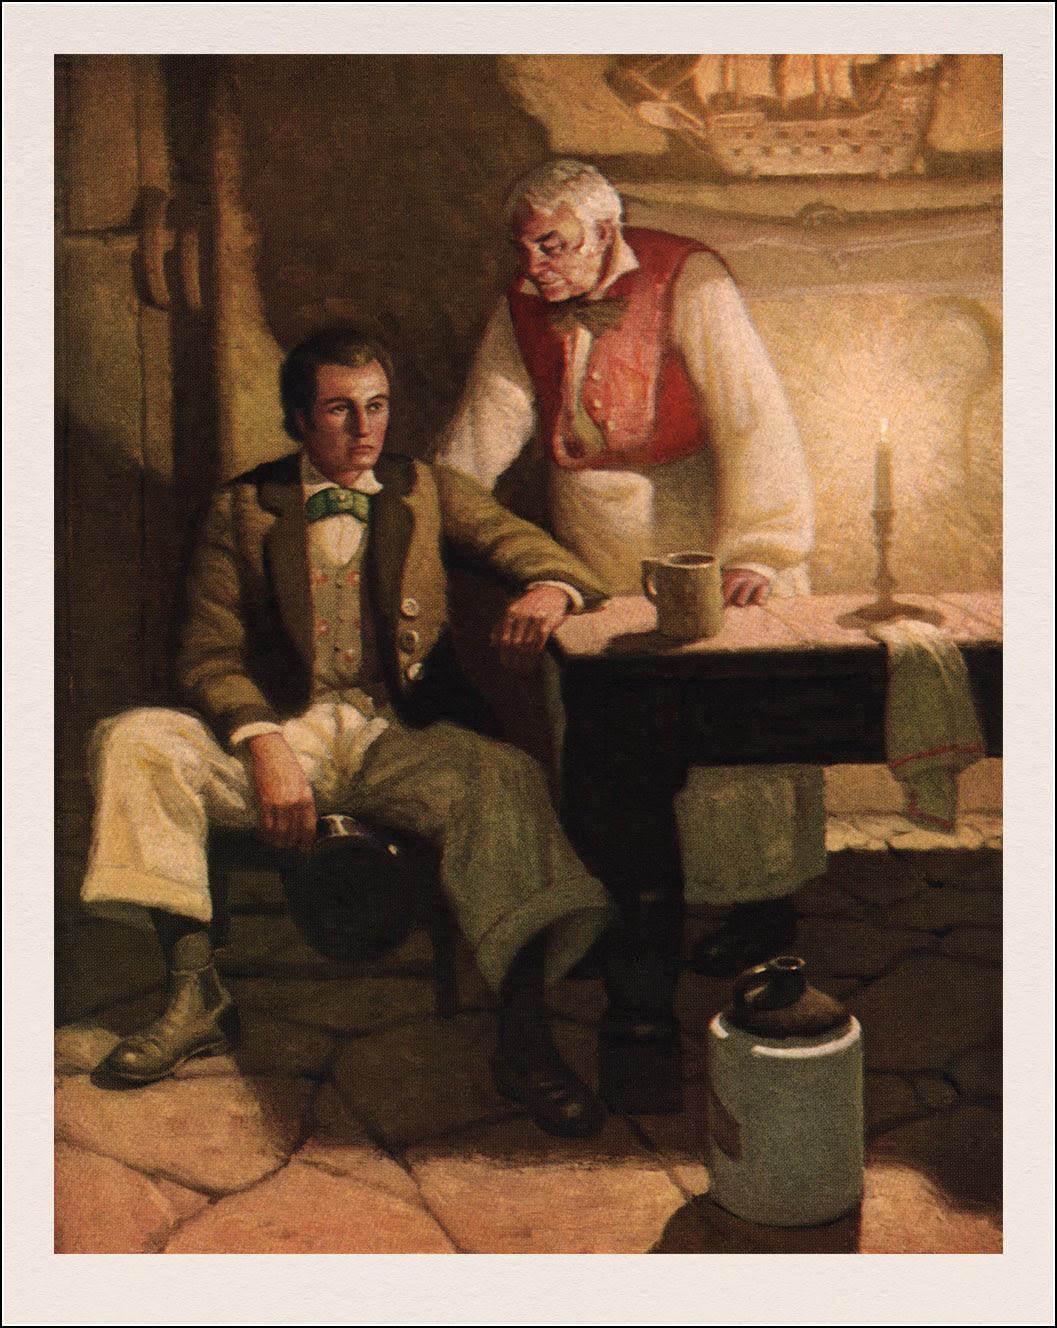 Mead Schaeffer, Moby Dick